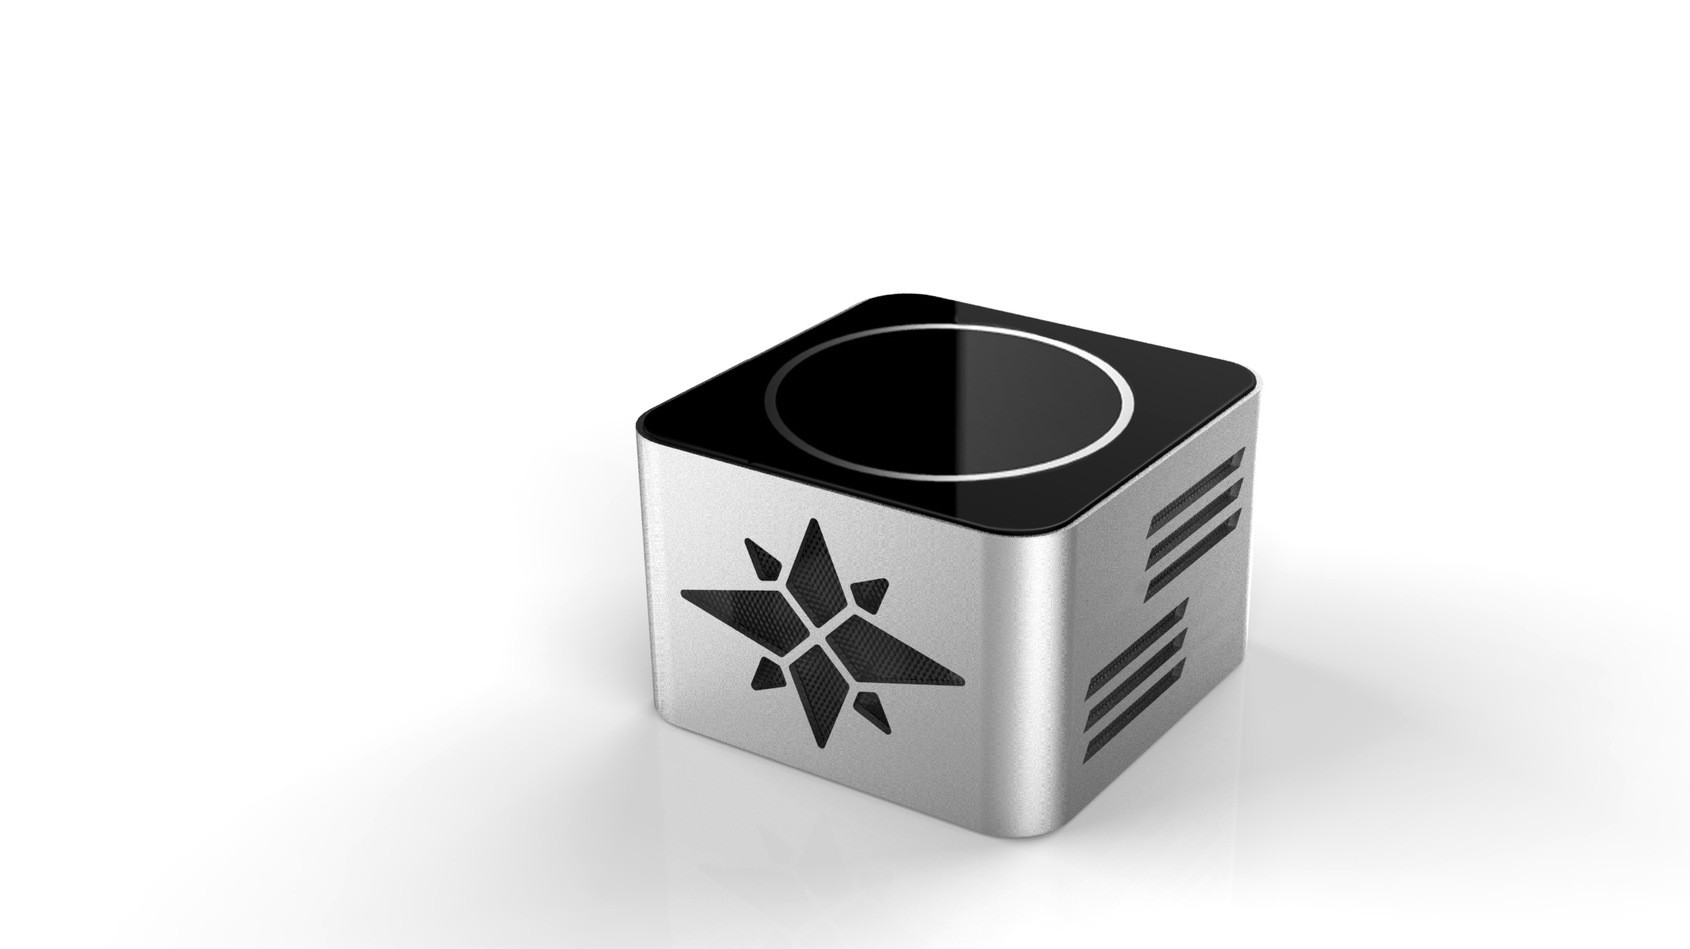 KR-8100A无线手势识别蓝牙音箱 NFC音箱铝合金蓝牙音箱 厂家直销